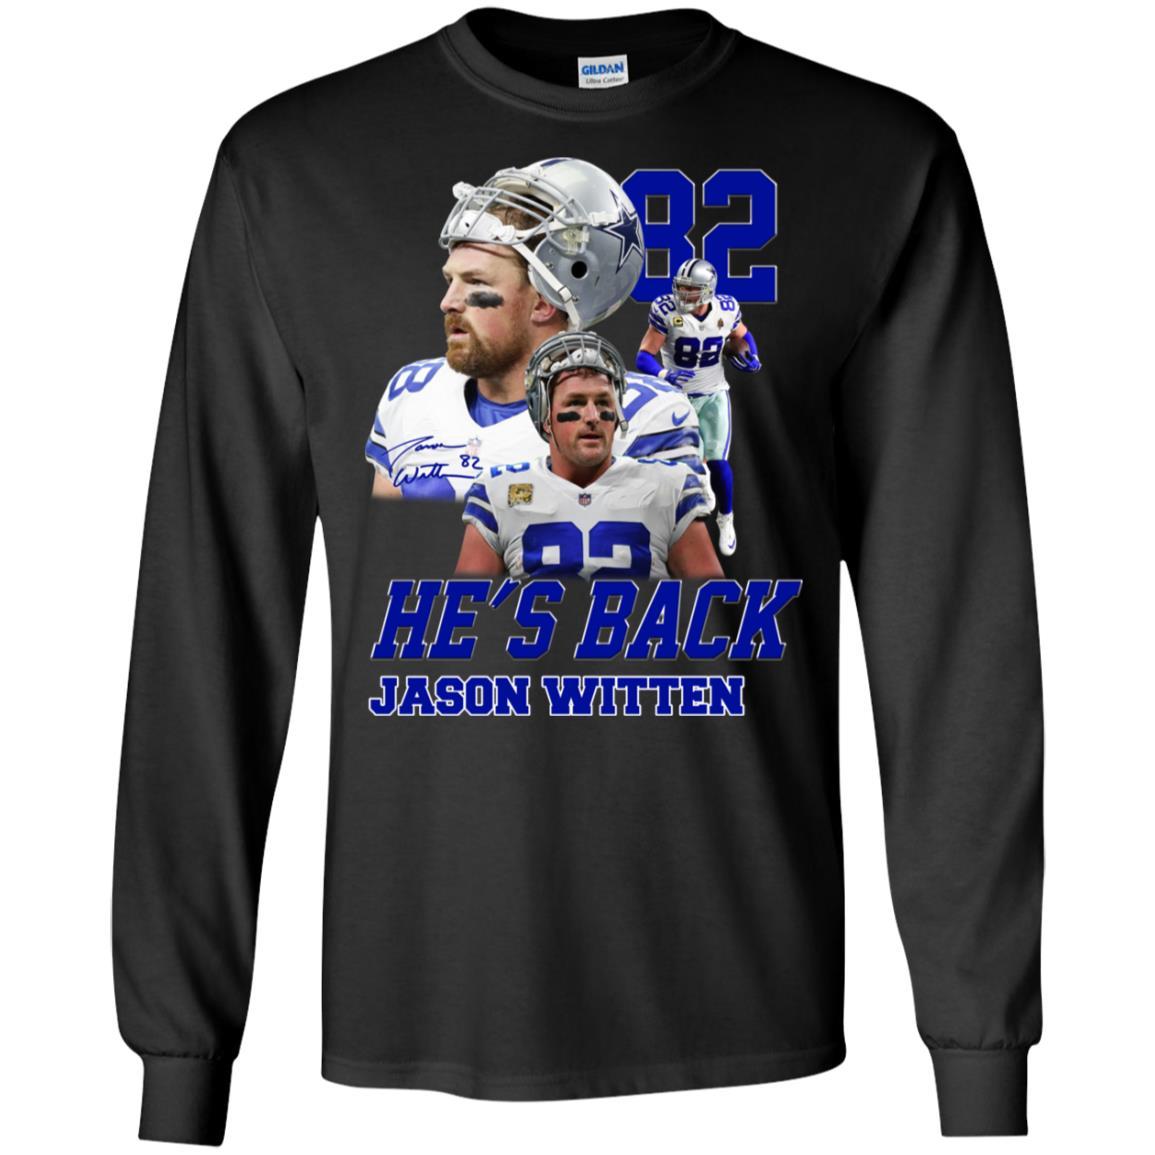 new product 0591d 818c5 Jason Witten Dallas Cowboys 82 He's back hoodie, ls, t shirt